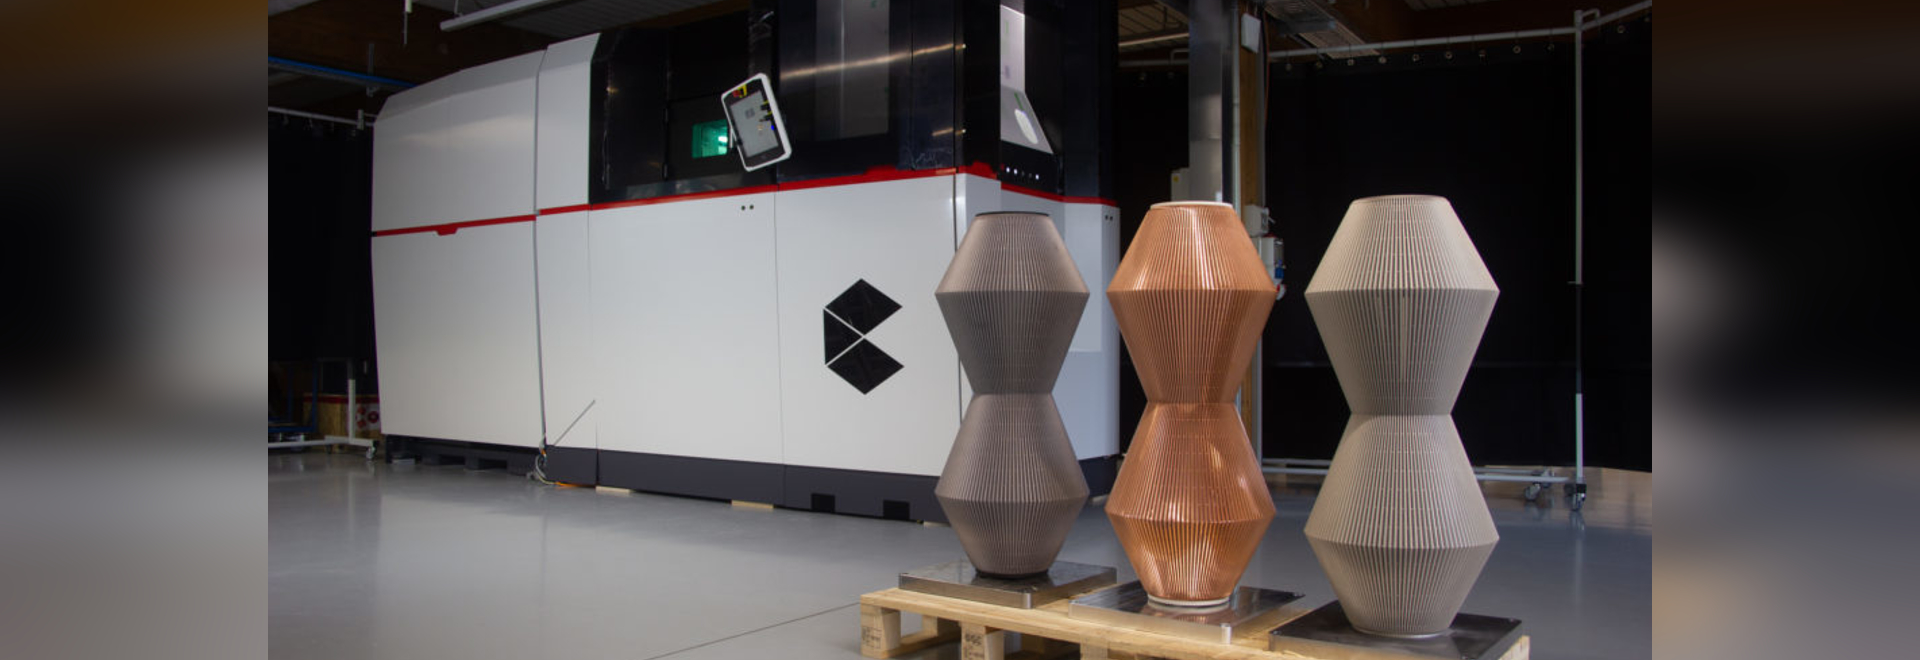 Sintavia acquires M4K-4 printers from AMCM